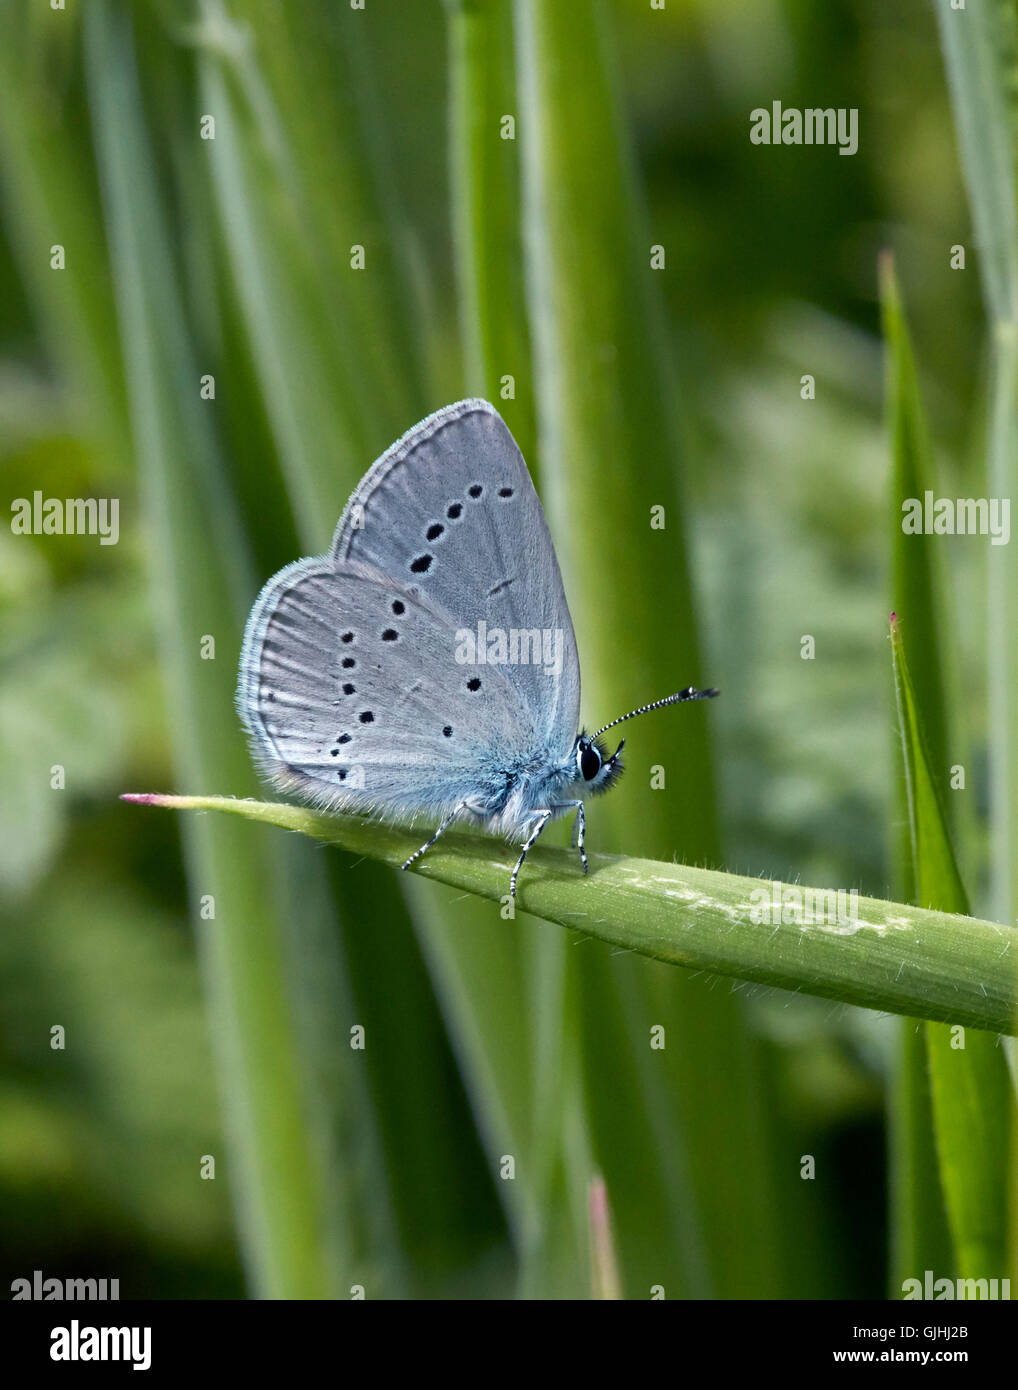 Petit papillon bleu perché sur l'herbe. Howell hill nature reserve, Ewell, Surrey, Angleterre. Photo Stock